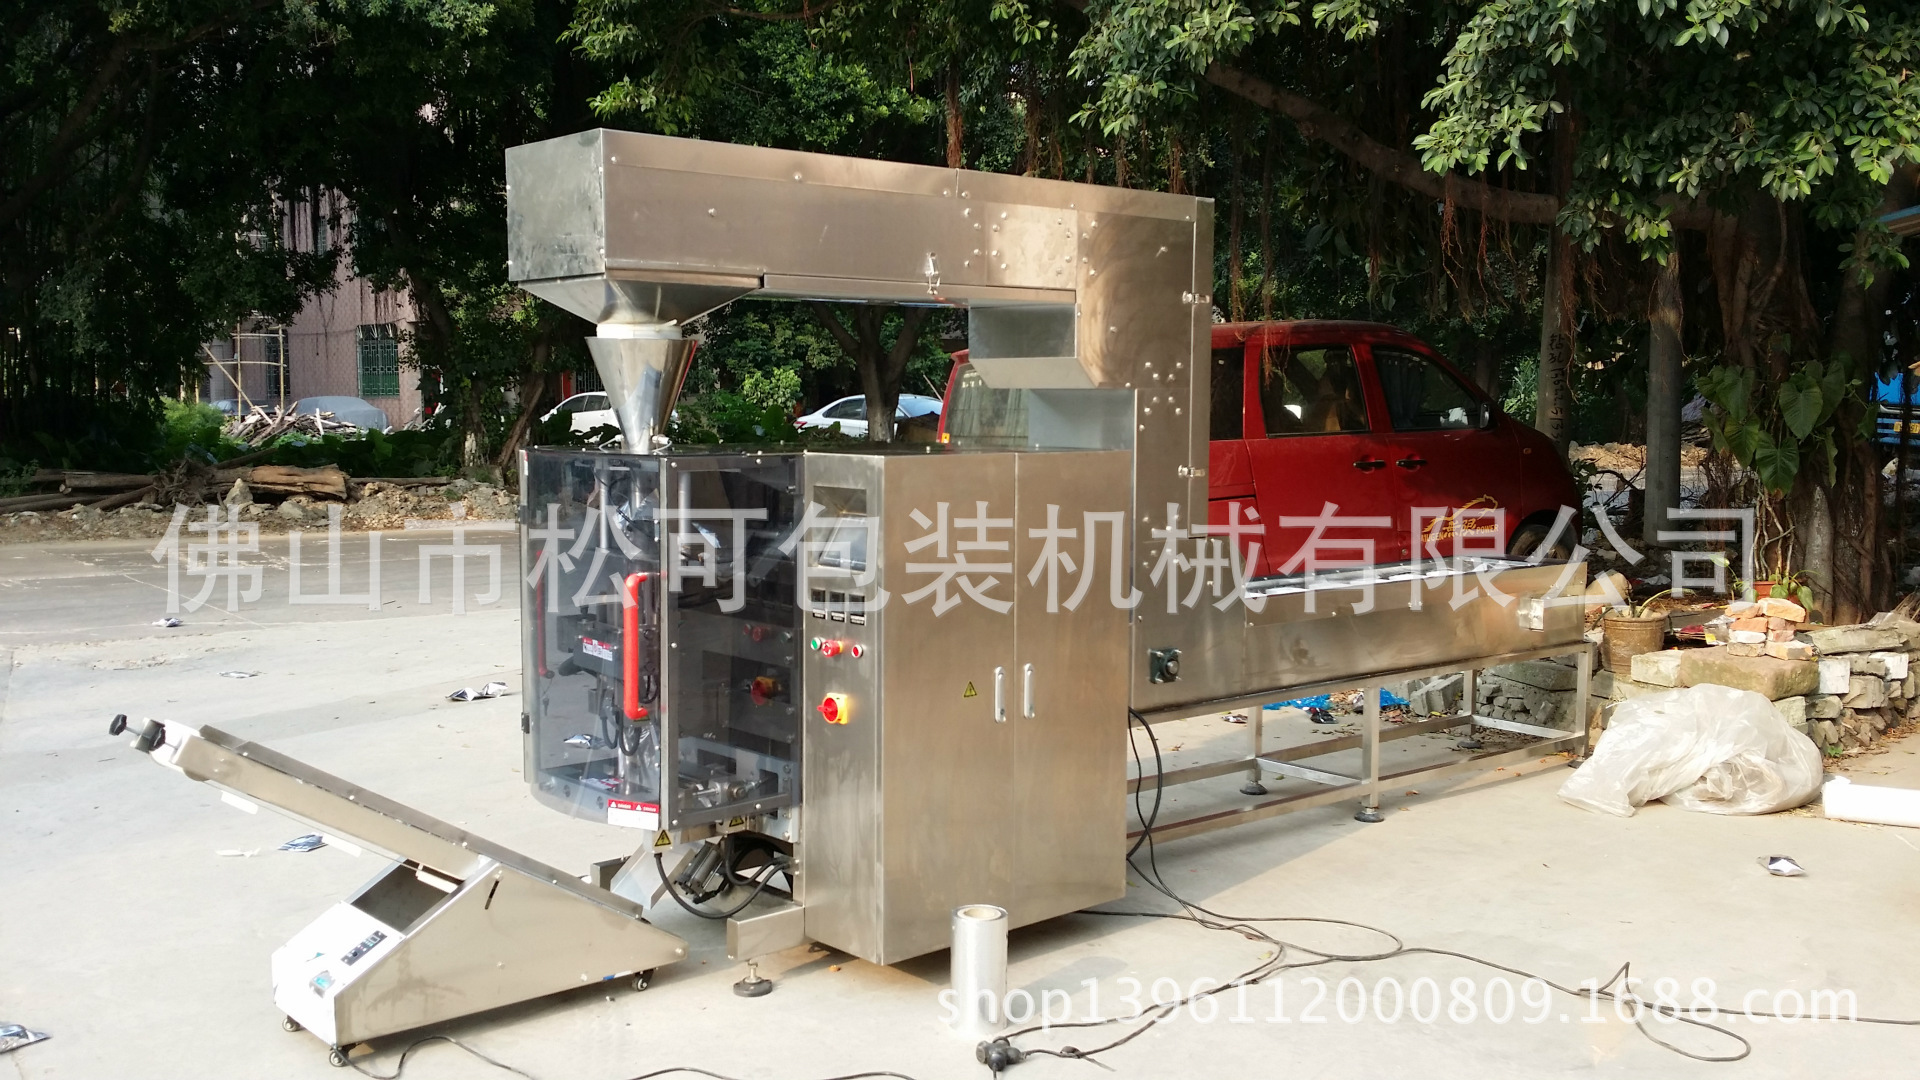 www.tengbo9.com三全儿童水饺包装机 冷冻食品半自动包装机械设备 欢